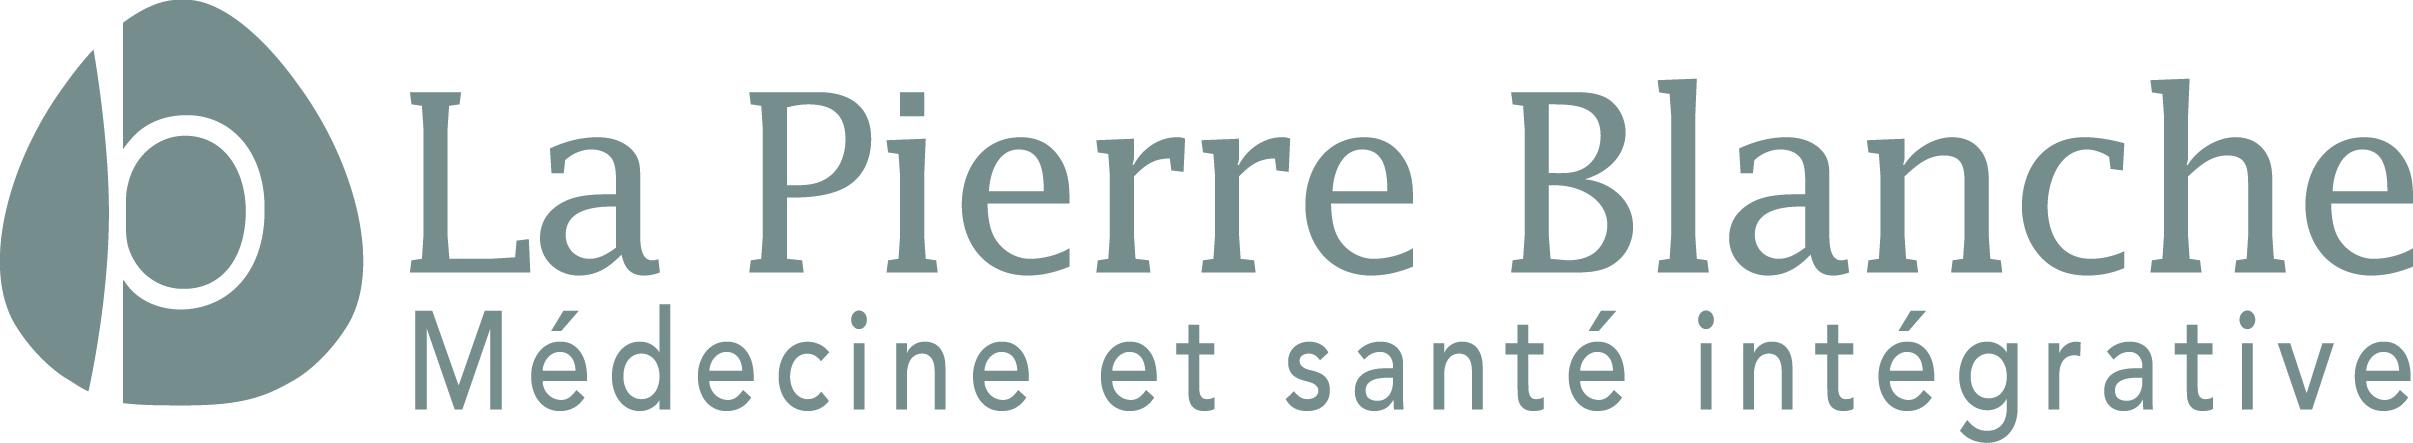 Immagine Centre de santé La Pierre Blanche - Coralisa SA